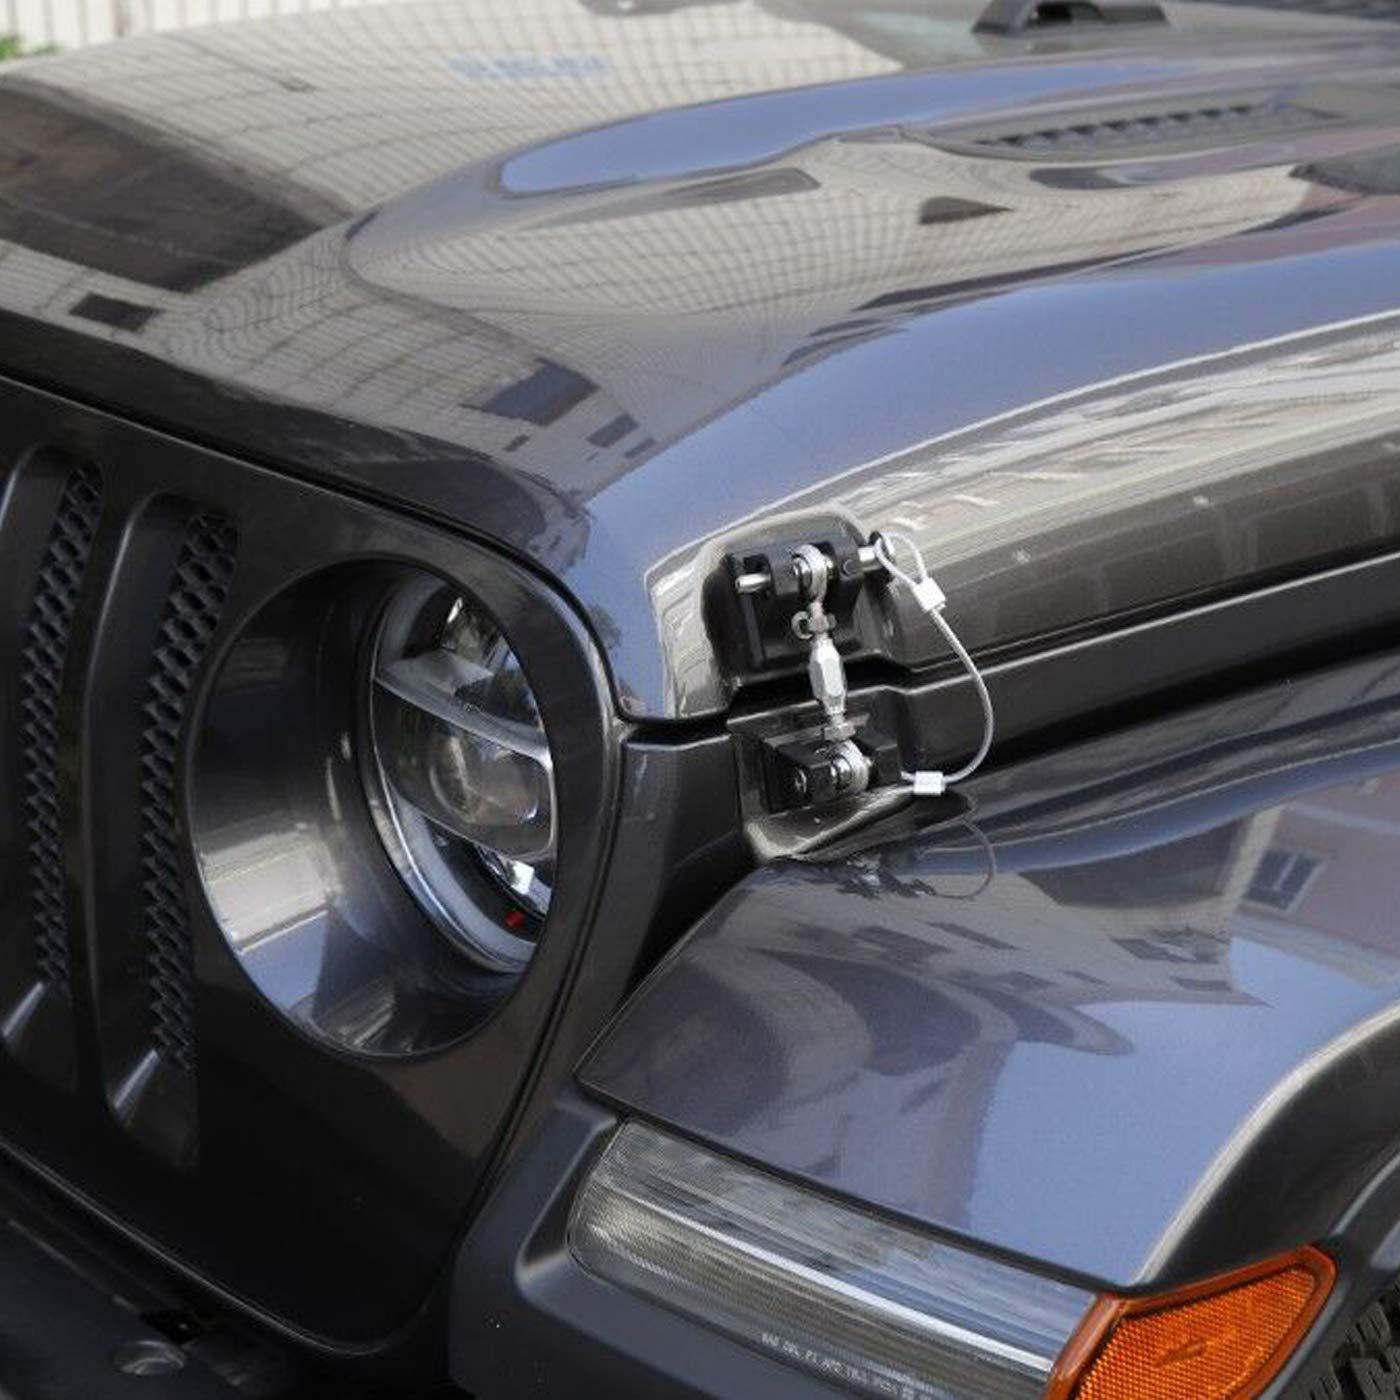 2007-2018 Hood Catch Latch Set Kit Hood Locking Black Aluminum Umlimted 4 Doors omotor Pair for Jeep Wrangler JK 2 Doors